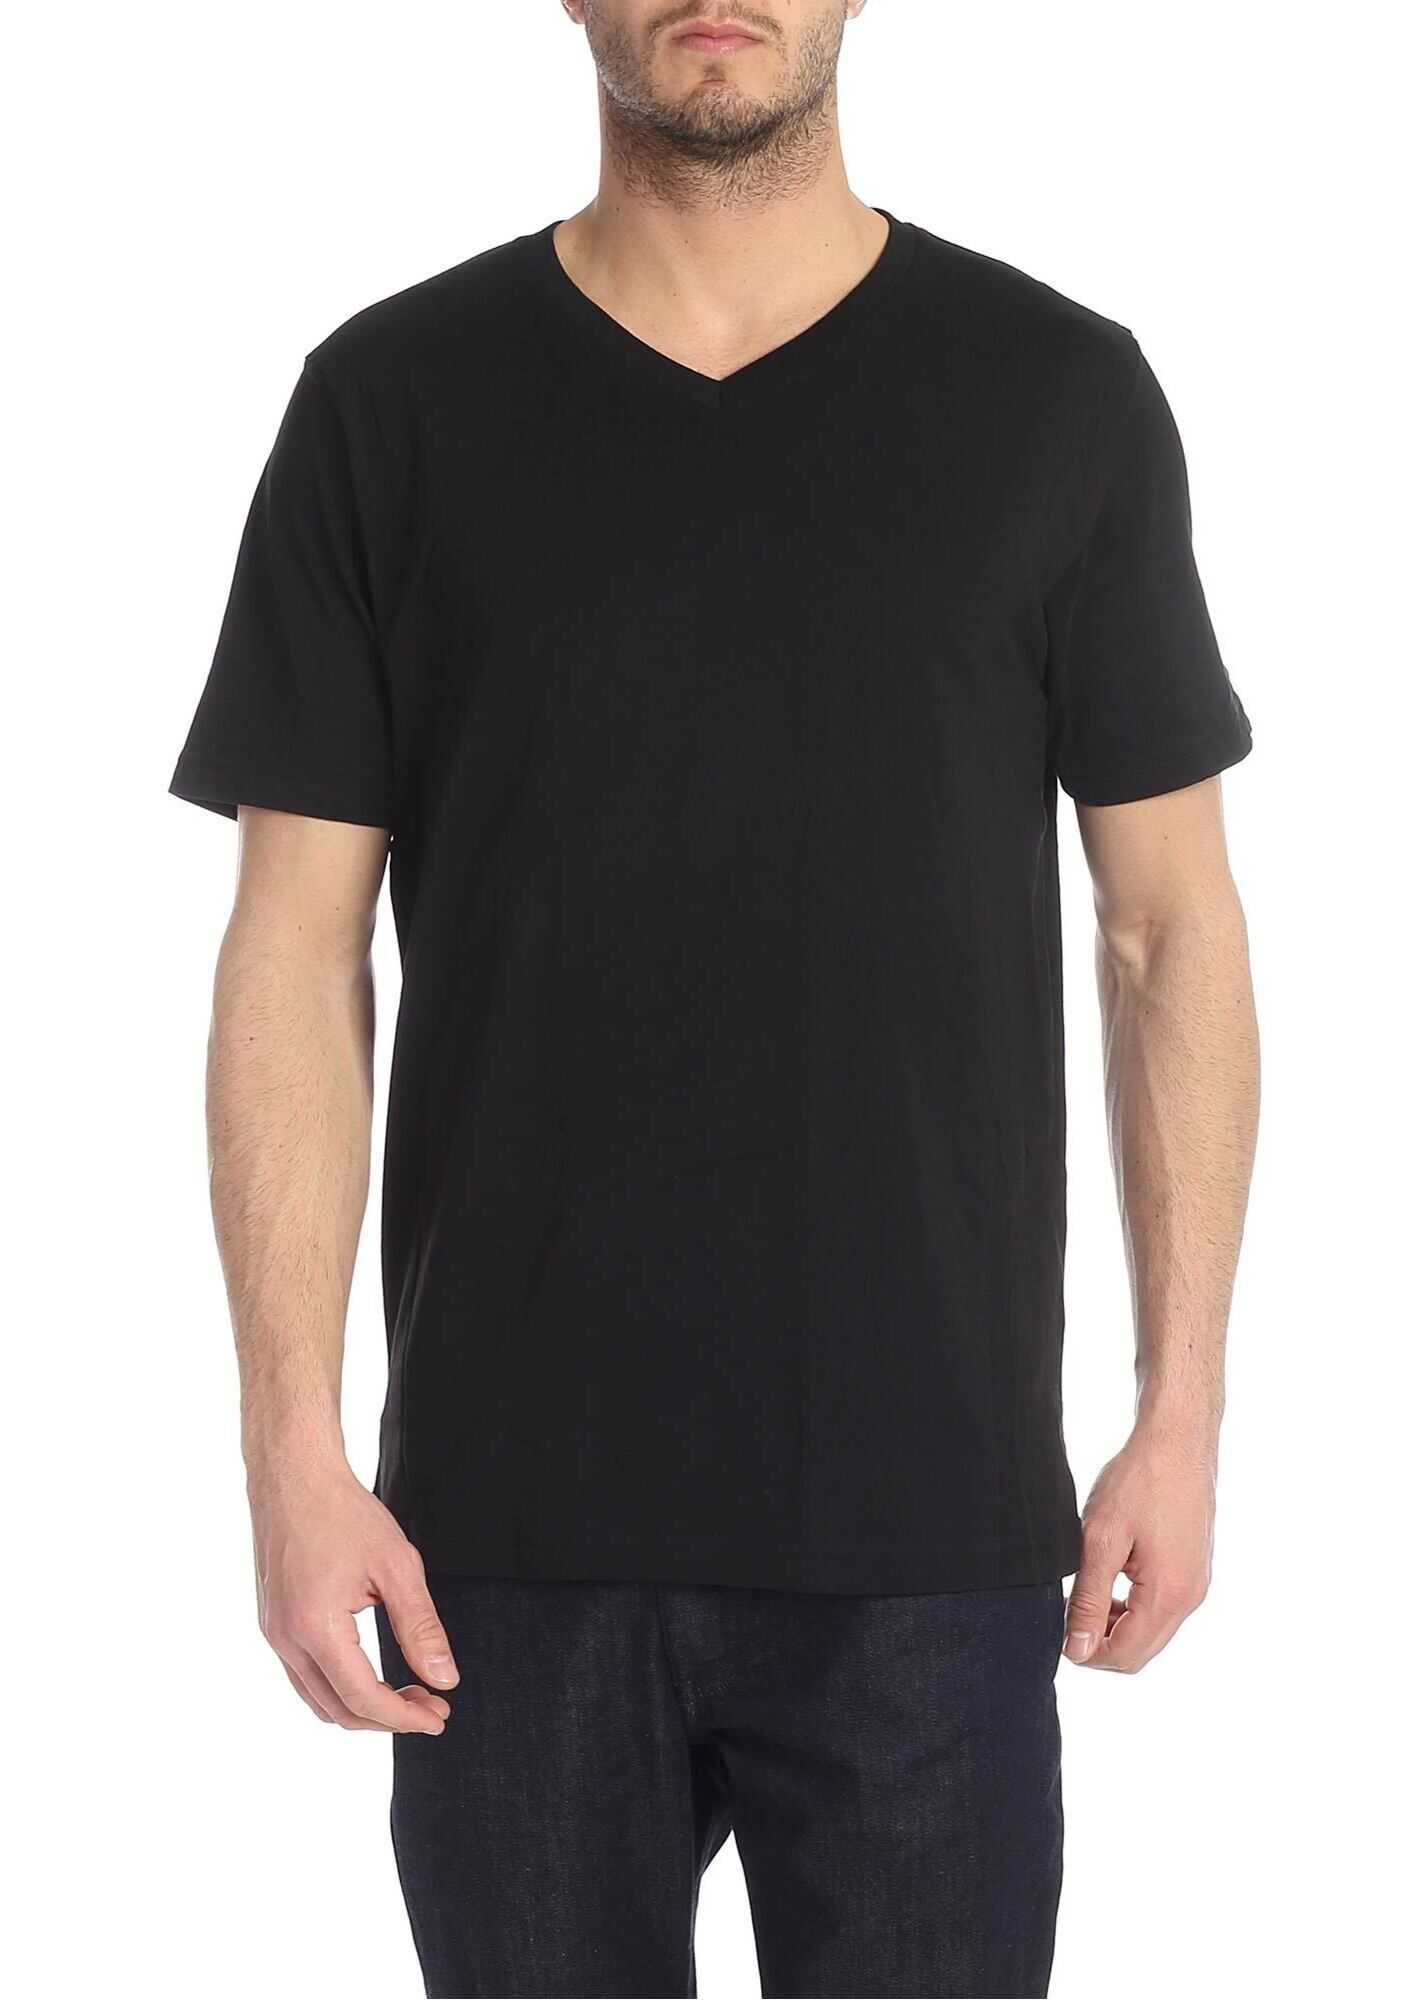 Set Of 2 Black T-Shirts